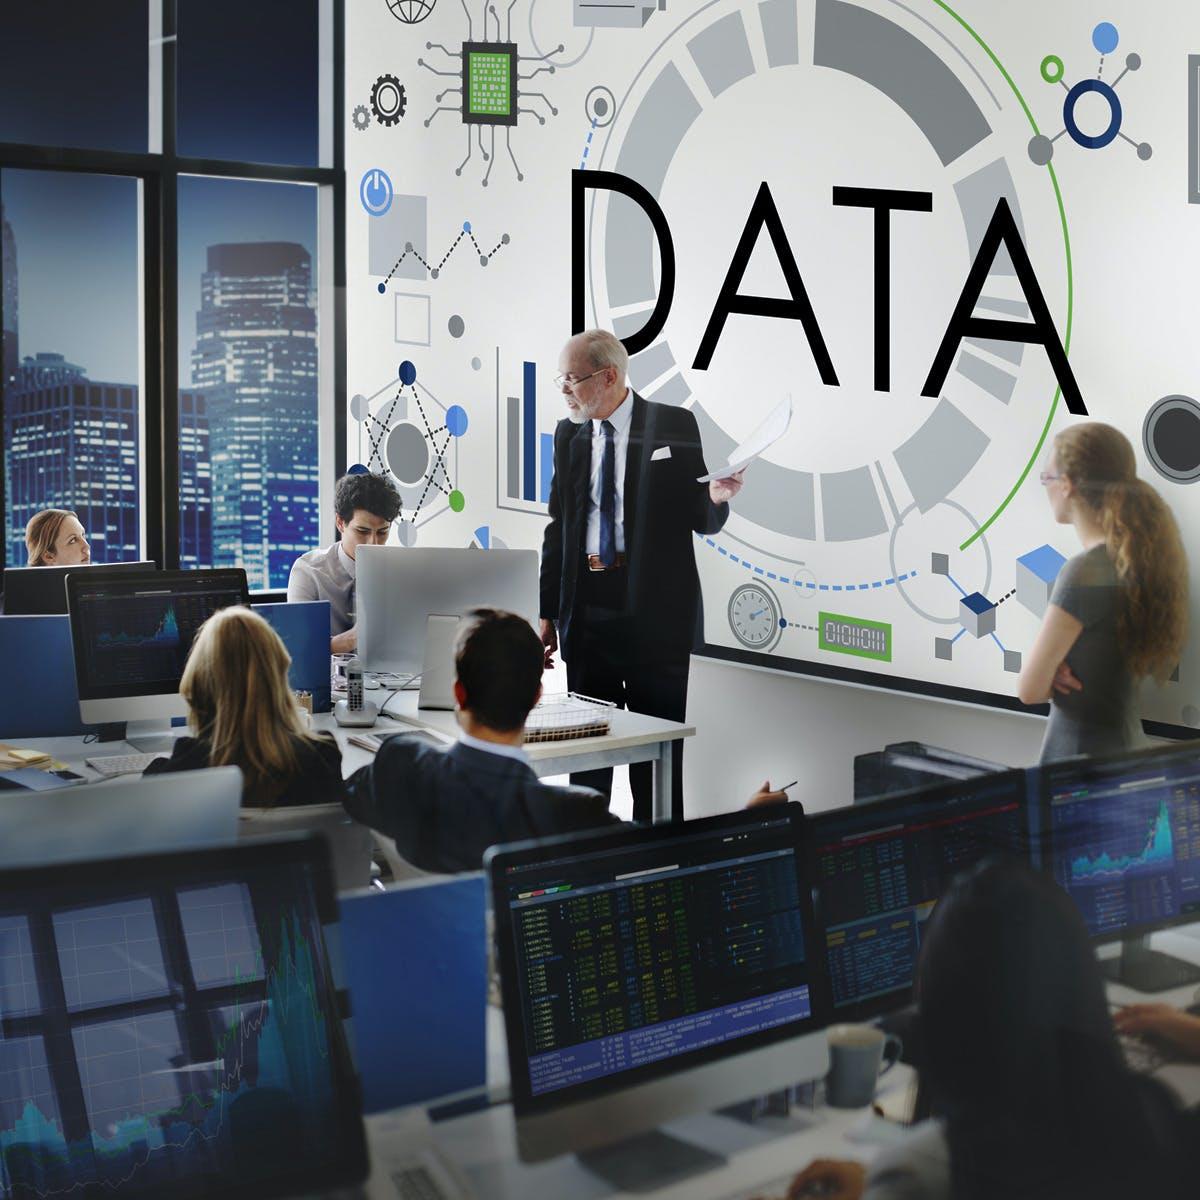 Business Analytics and Digital Media